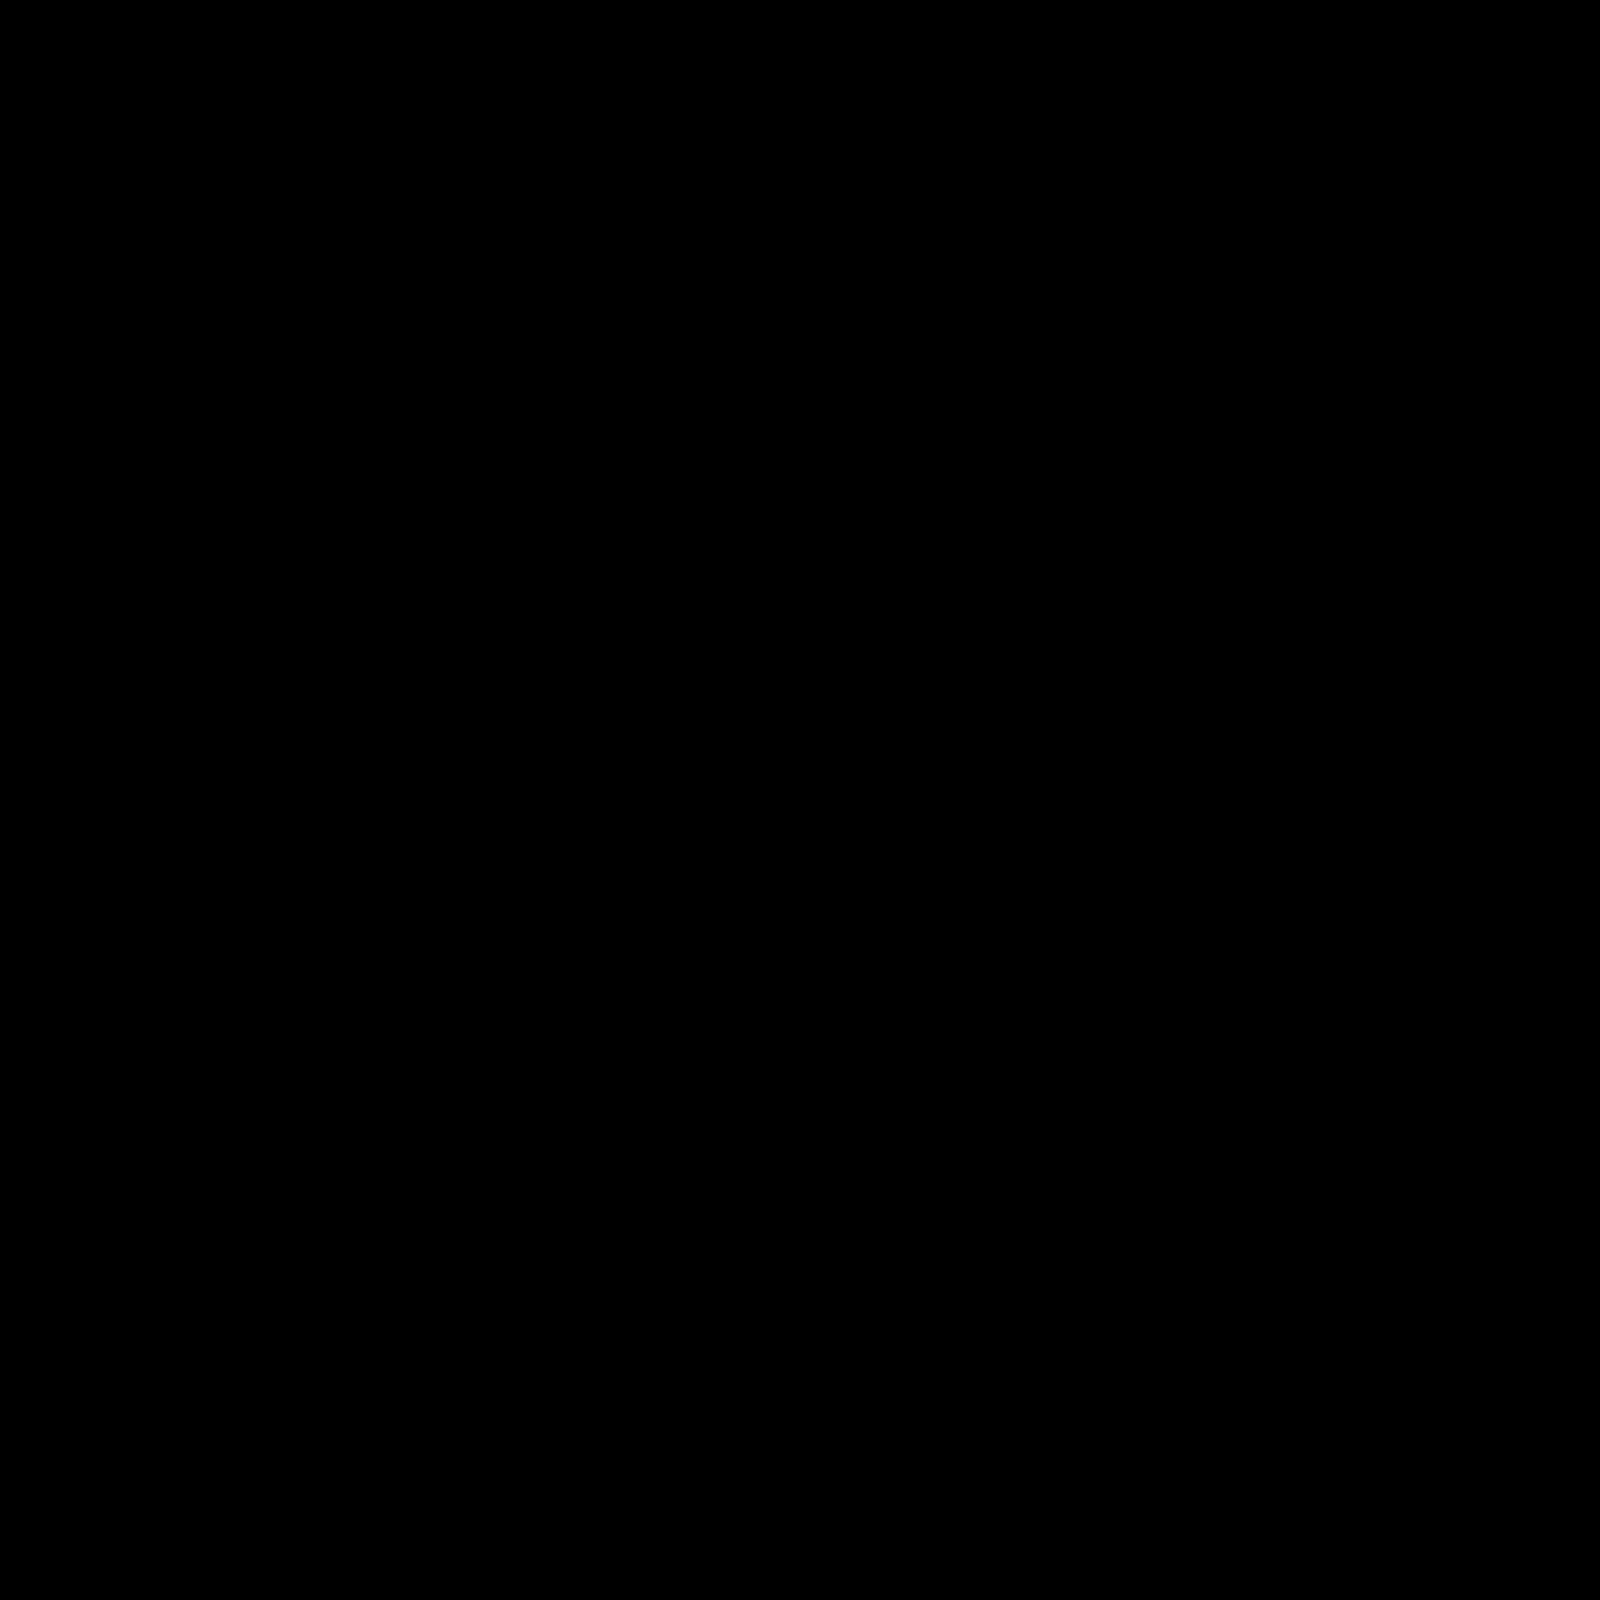 Audit icon